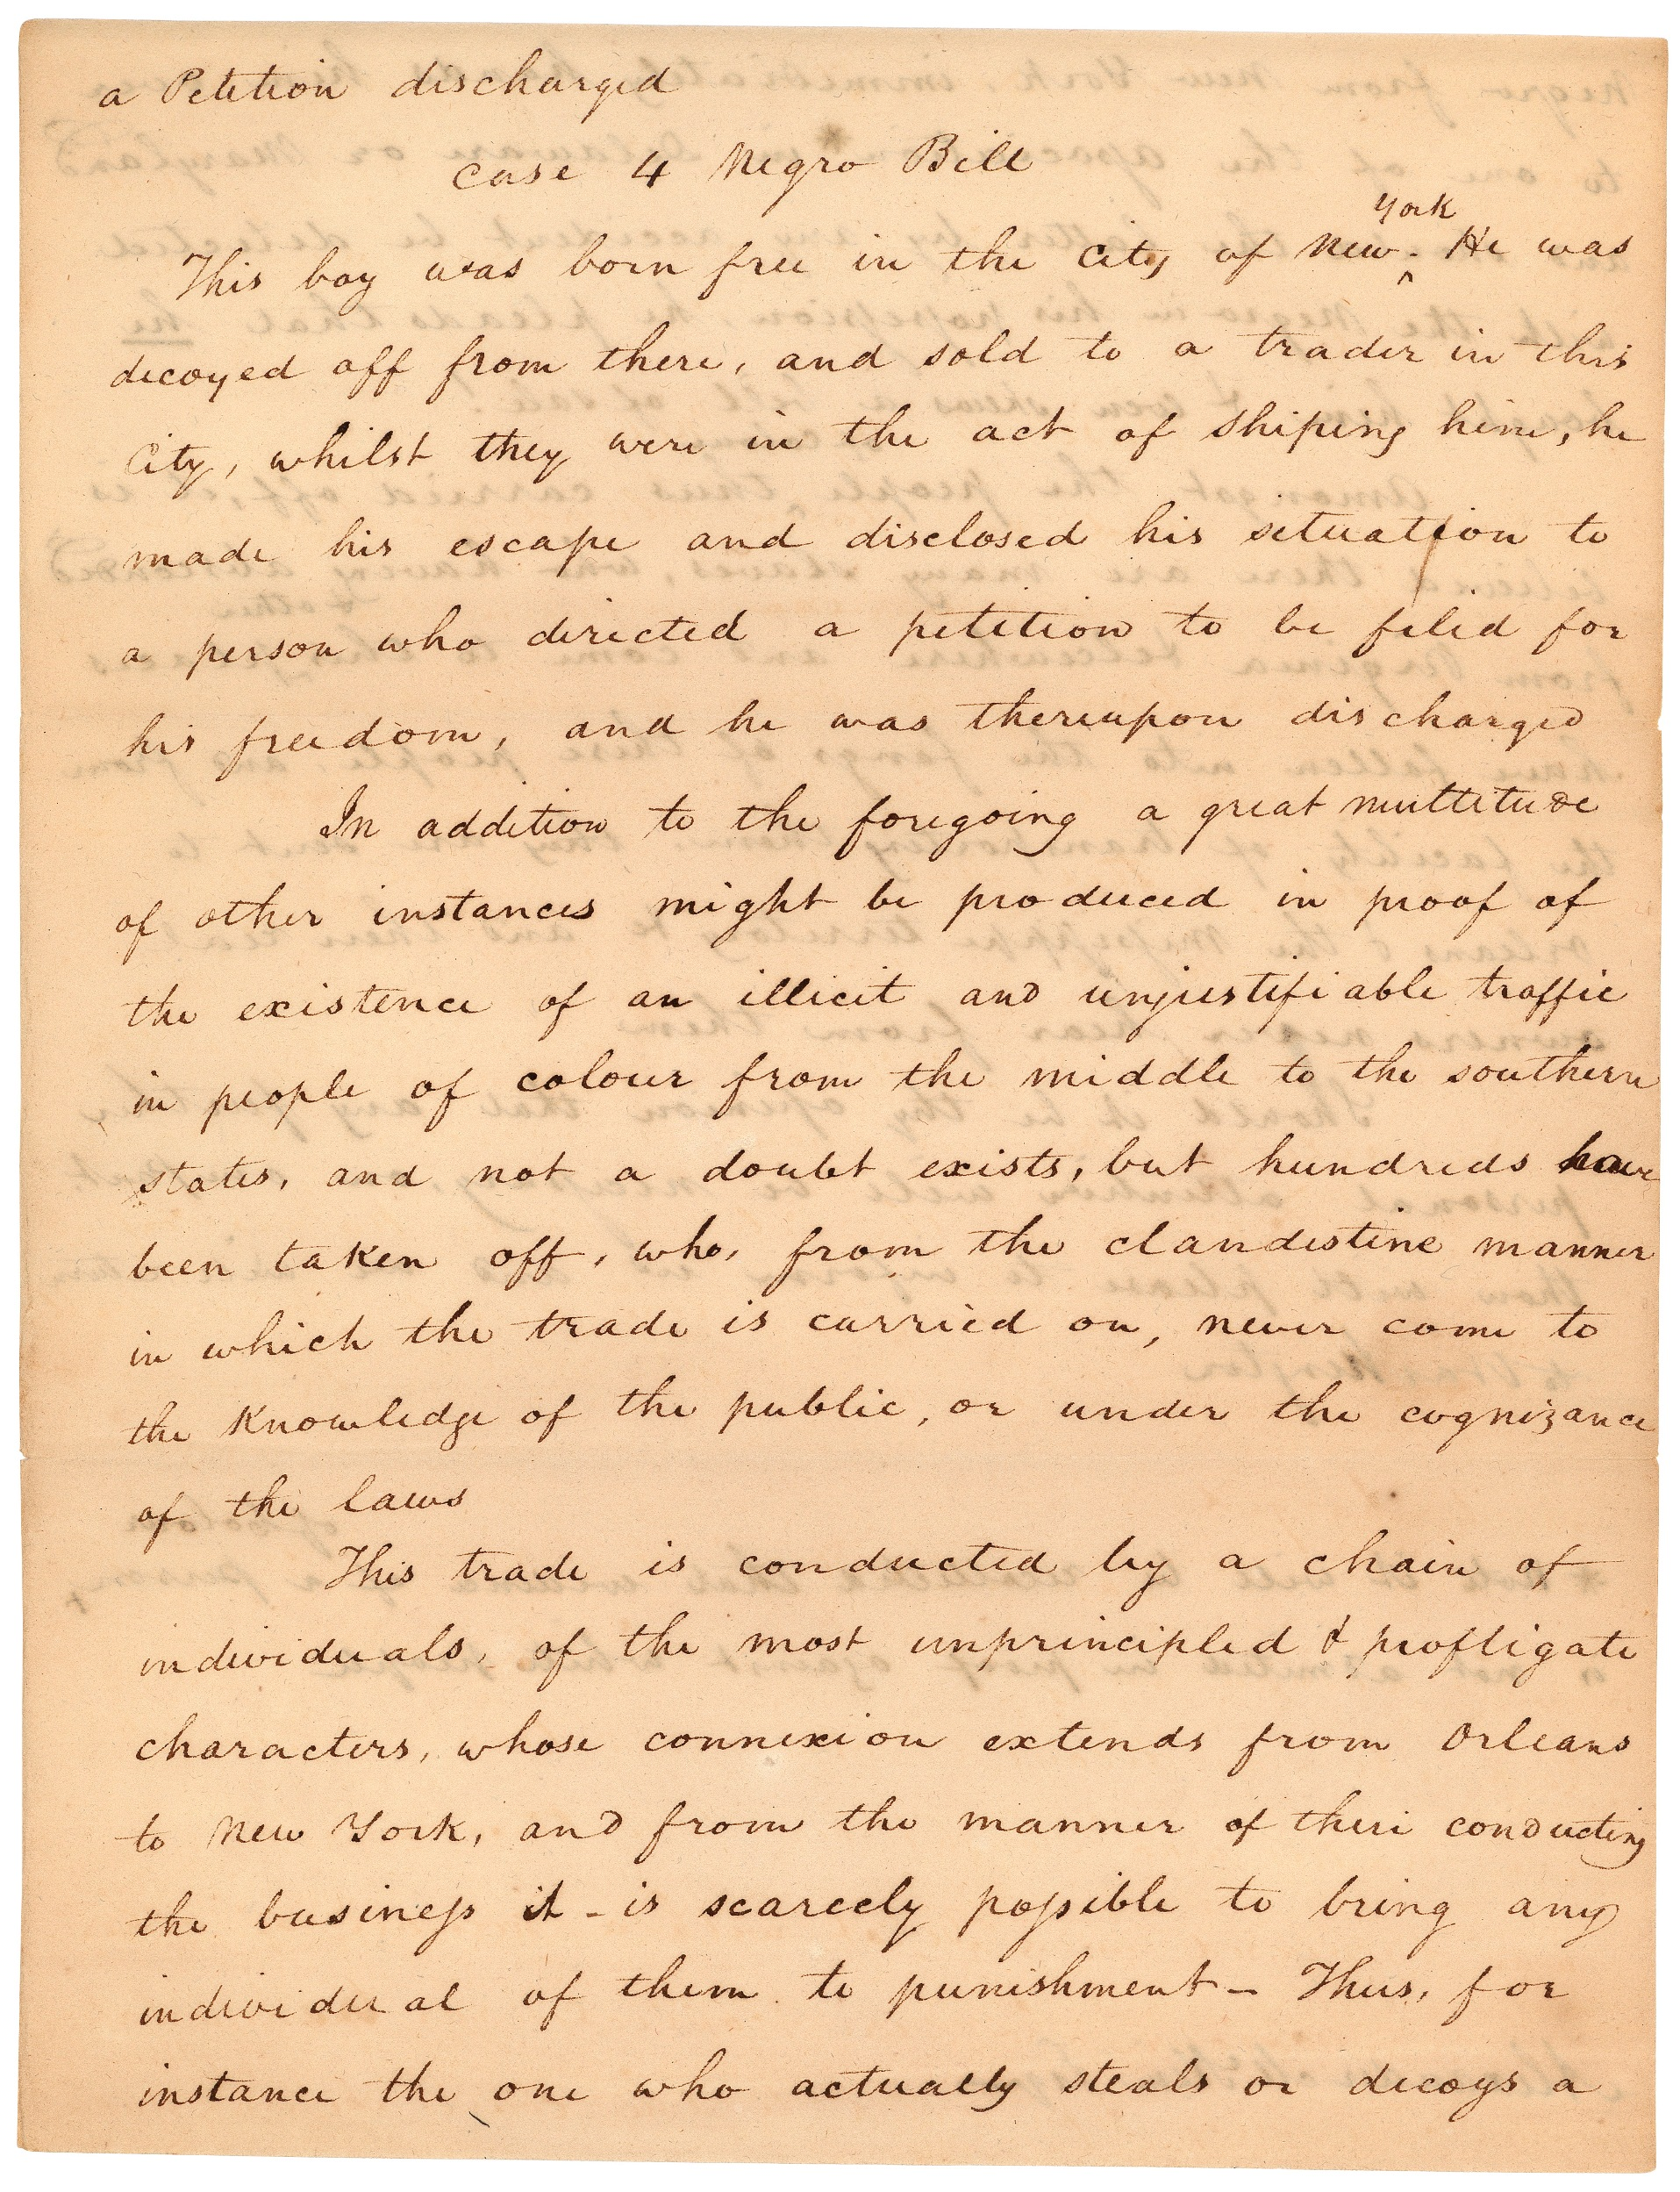 Letter from Elisha Tyson regarding kidnapped free blacks, December 5, 1811, page 3.